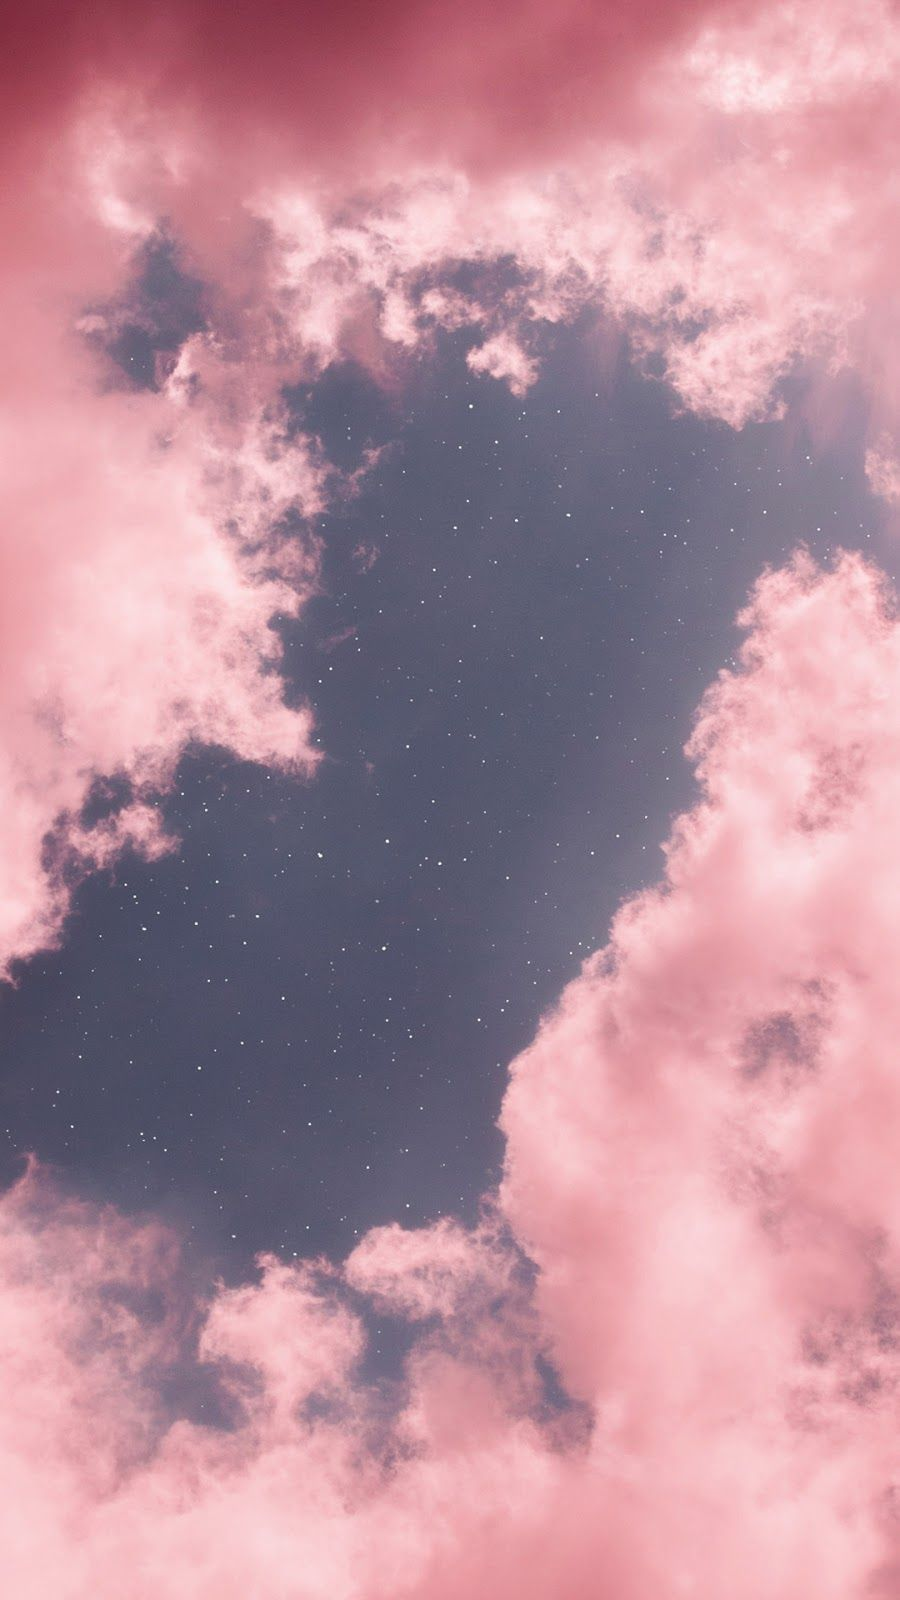 wallpaper #wallpaper wallpaper pink #wallpaperpink  Tags: #wallpaperiphone , #wallpaperbackgrounds , #wallpapergirl , #wallpapertumblr , #wallpaperaccentwall , #wallpaperquotes , #wallpaperdesktop , #wallpaperdisney ,  wallpaper tumblr , wallpaper disney , wallpaper girl , wallpaper quotes , wallpaper desktop , wallpaper accent wall , wallpaper backgrounds , wallpaper iphone Pink clouds wallpaper